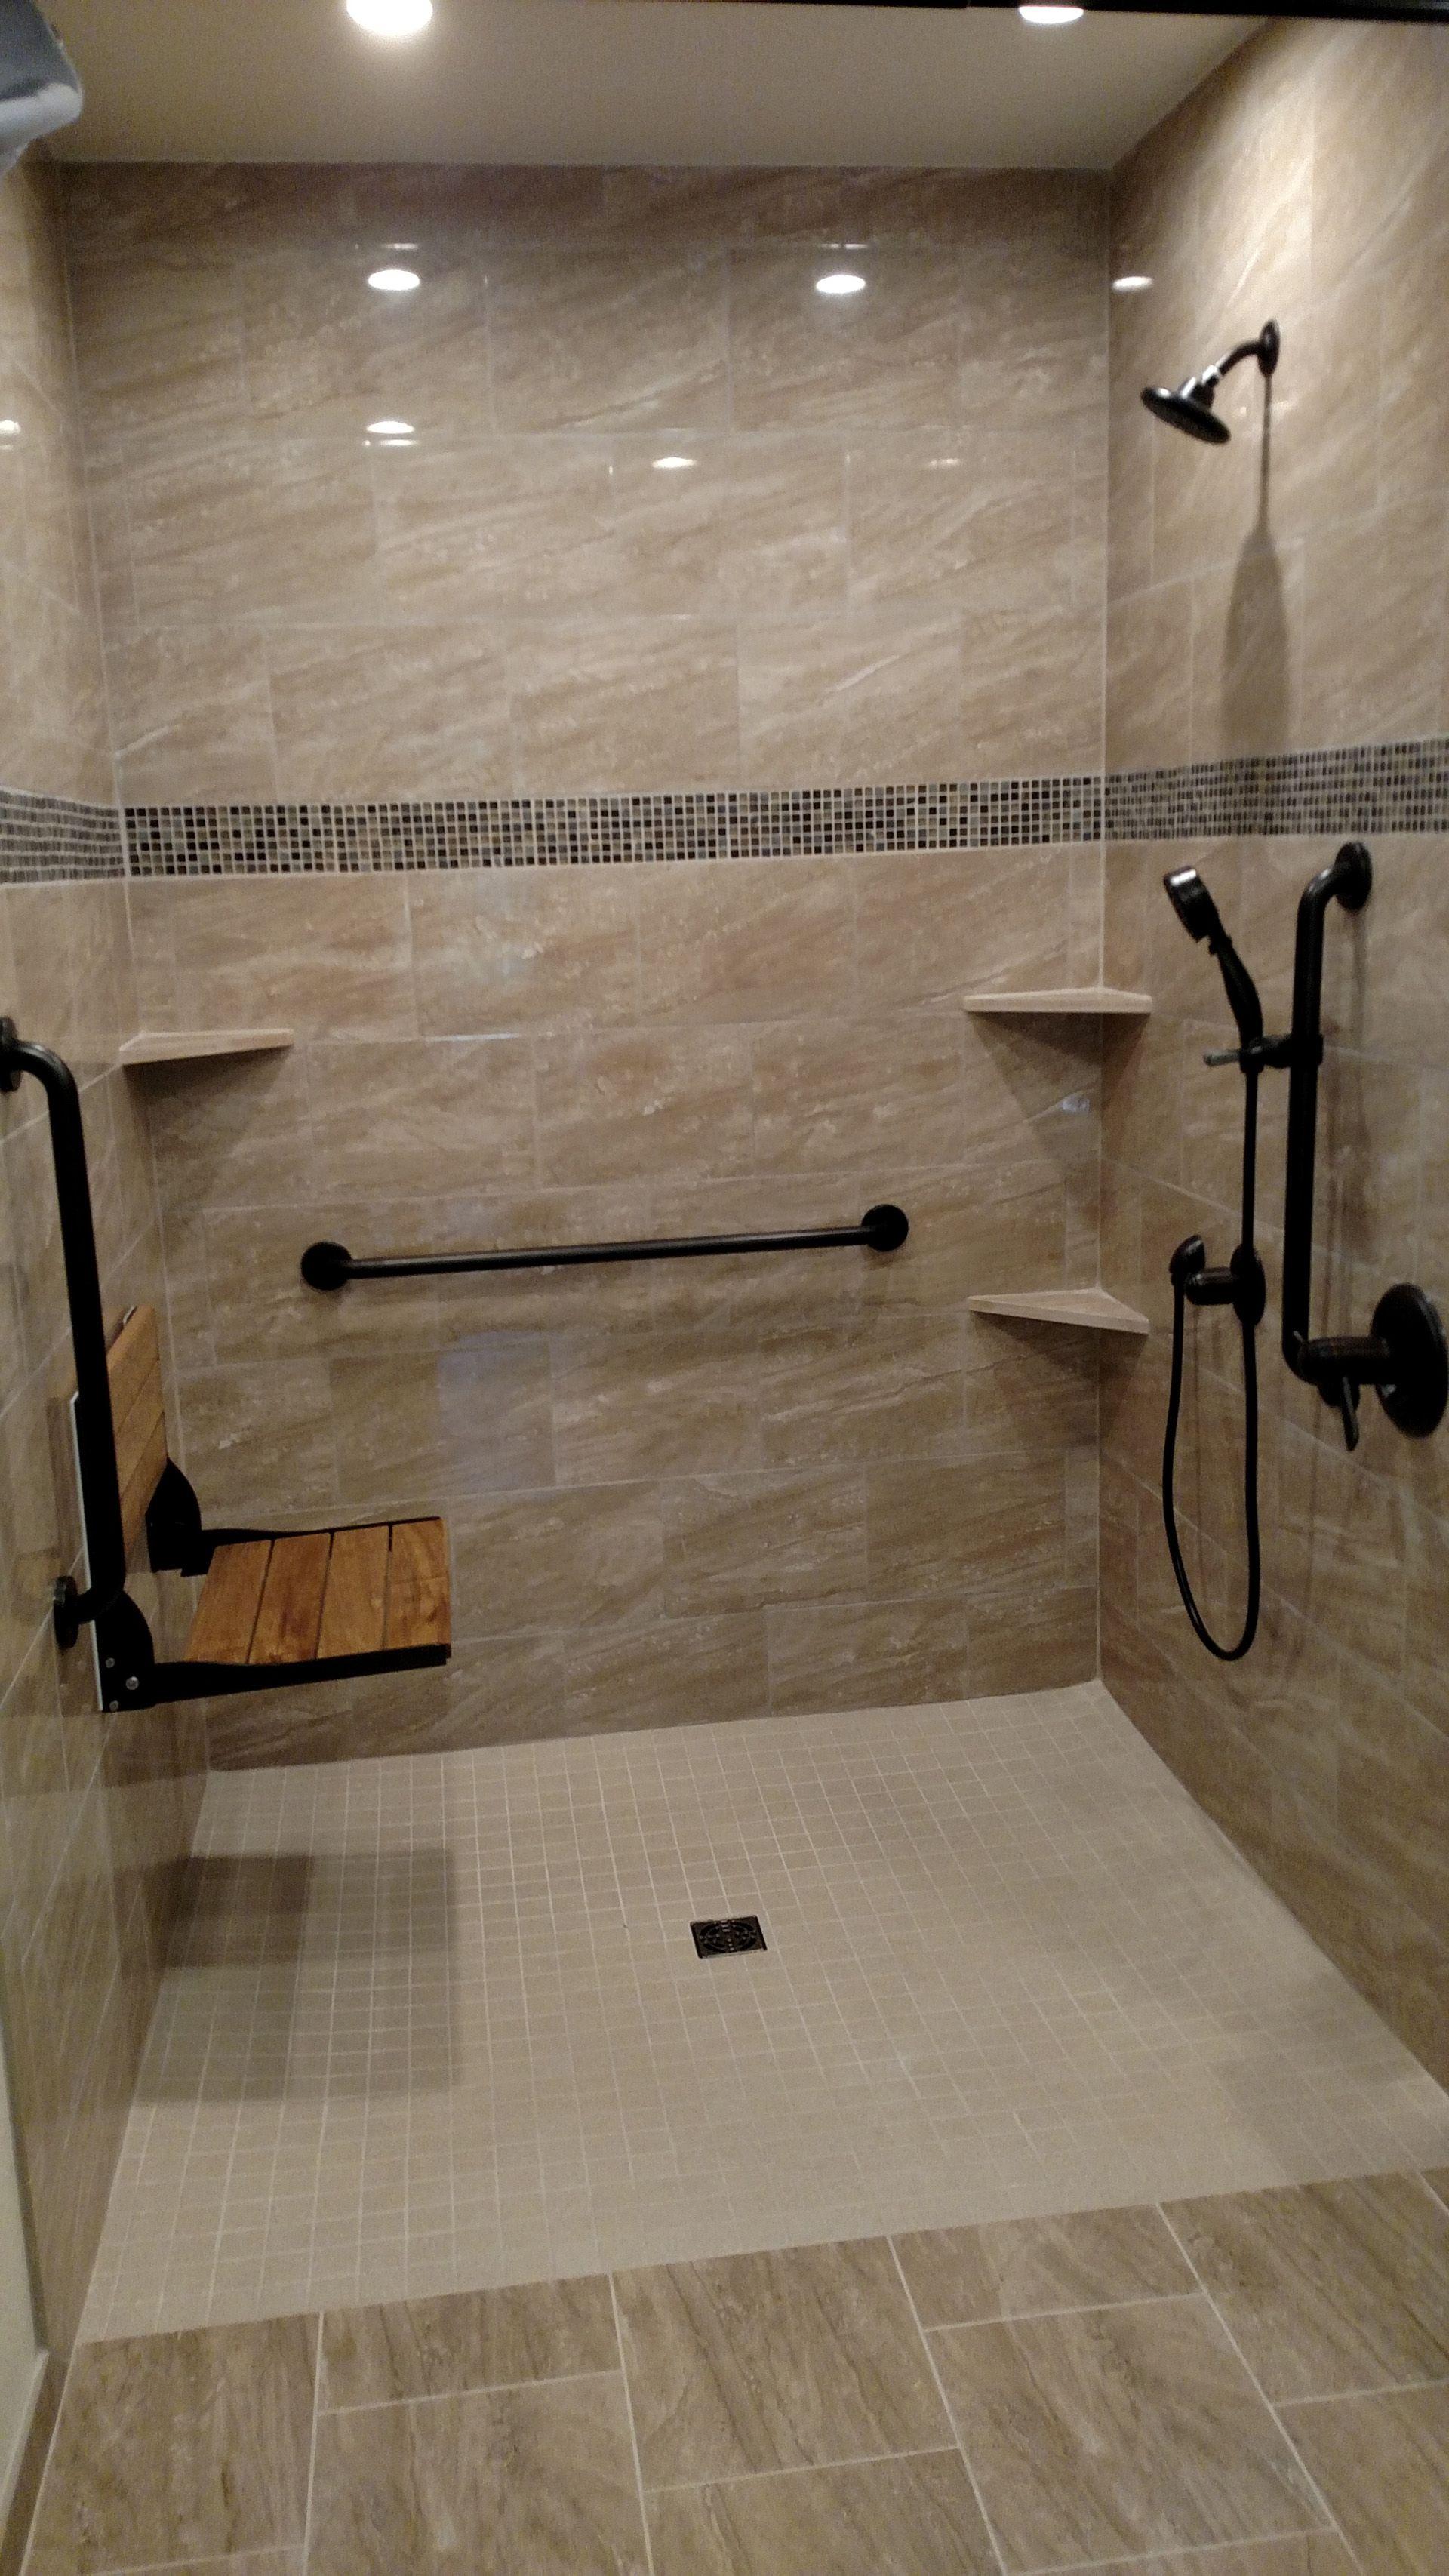 Accessible Showers Handicap Bathroom Design Bathrooms Remodel Accessible Bathroom Design